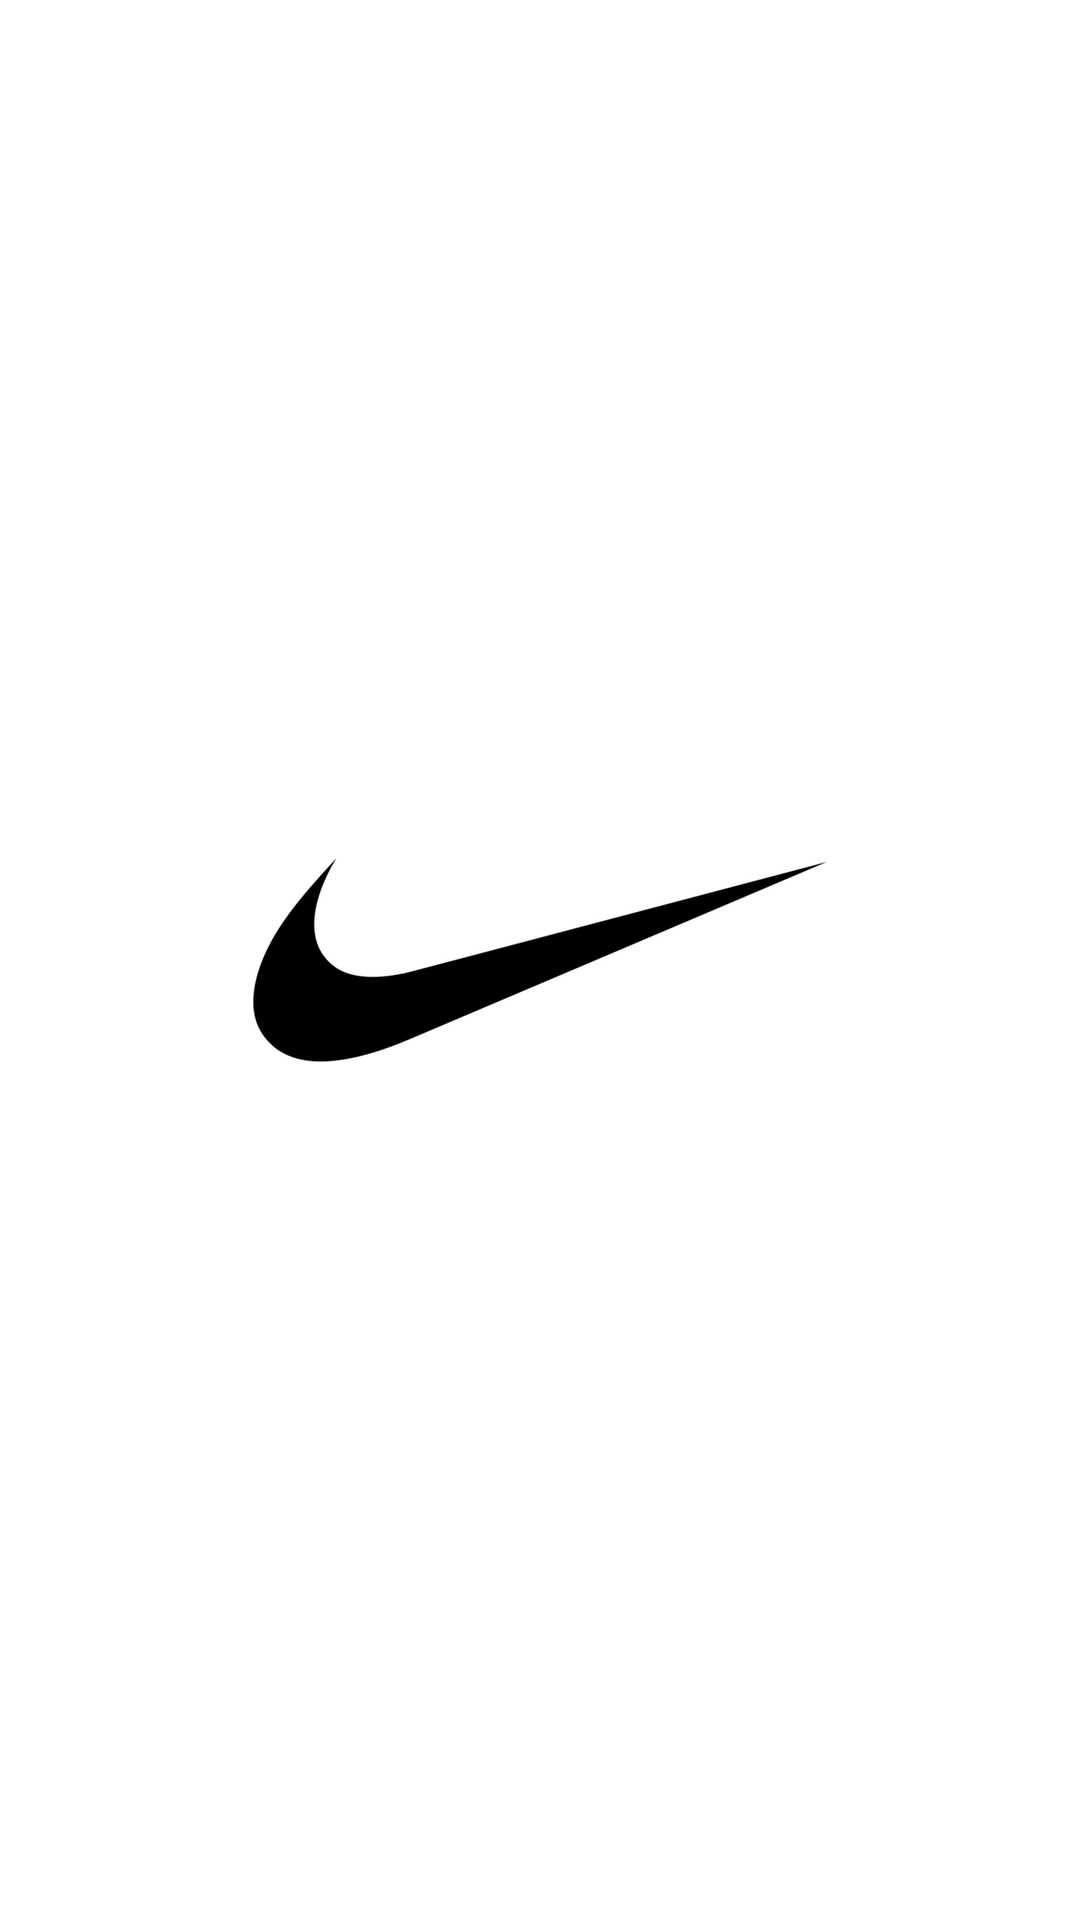 Nike01 ナイキ 待ち受け Nba 壁紙 Iphone 用壁紙